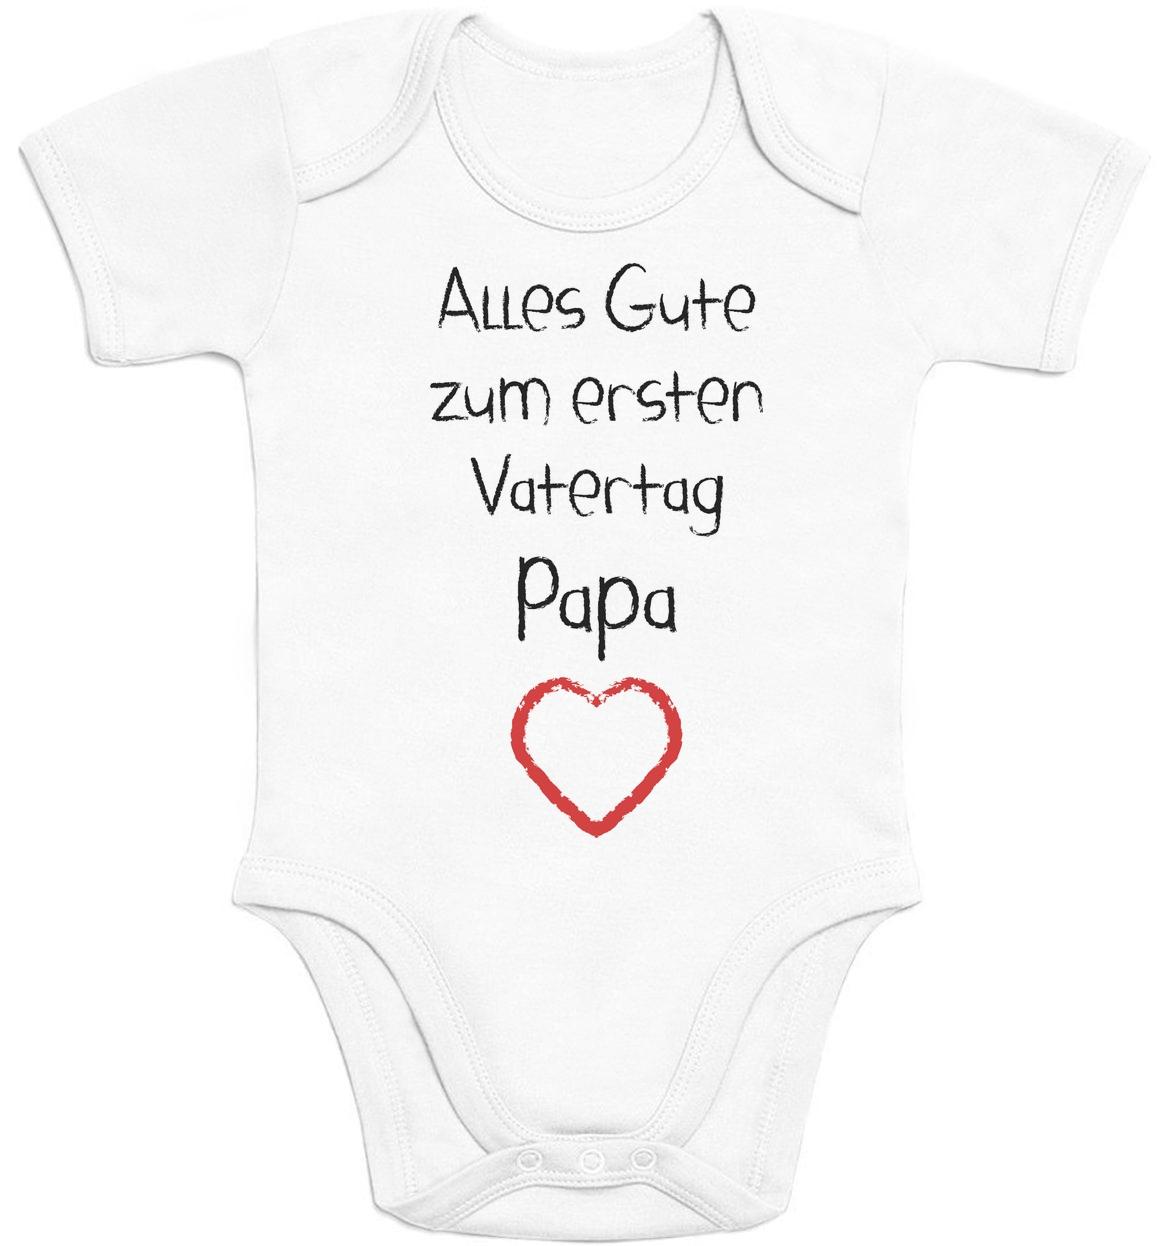 alles gute zum ersten vatertag papa herz love vater baby geschenk baby body mode ebay. Black Bedroom Furniture Sets. Home Design Ideas